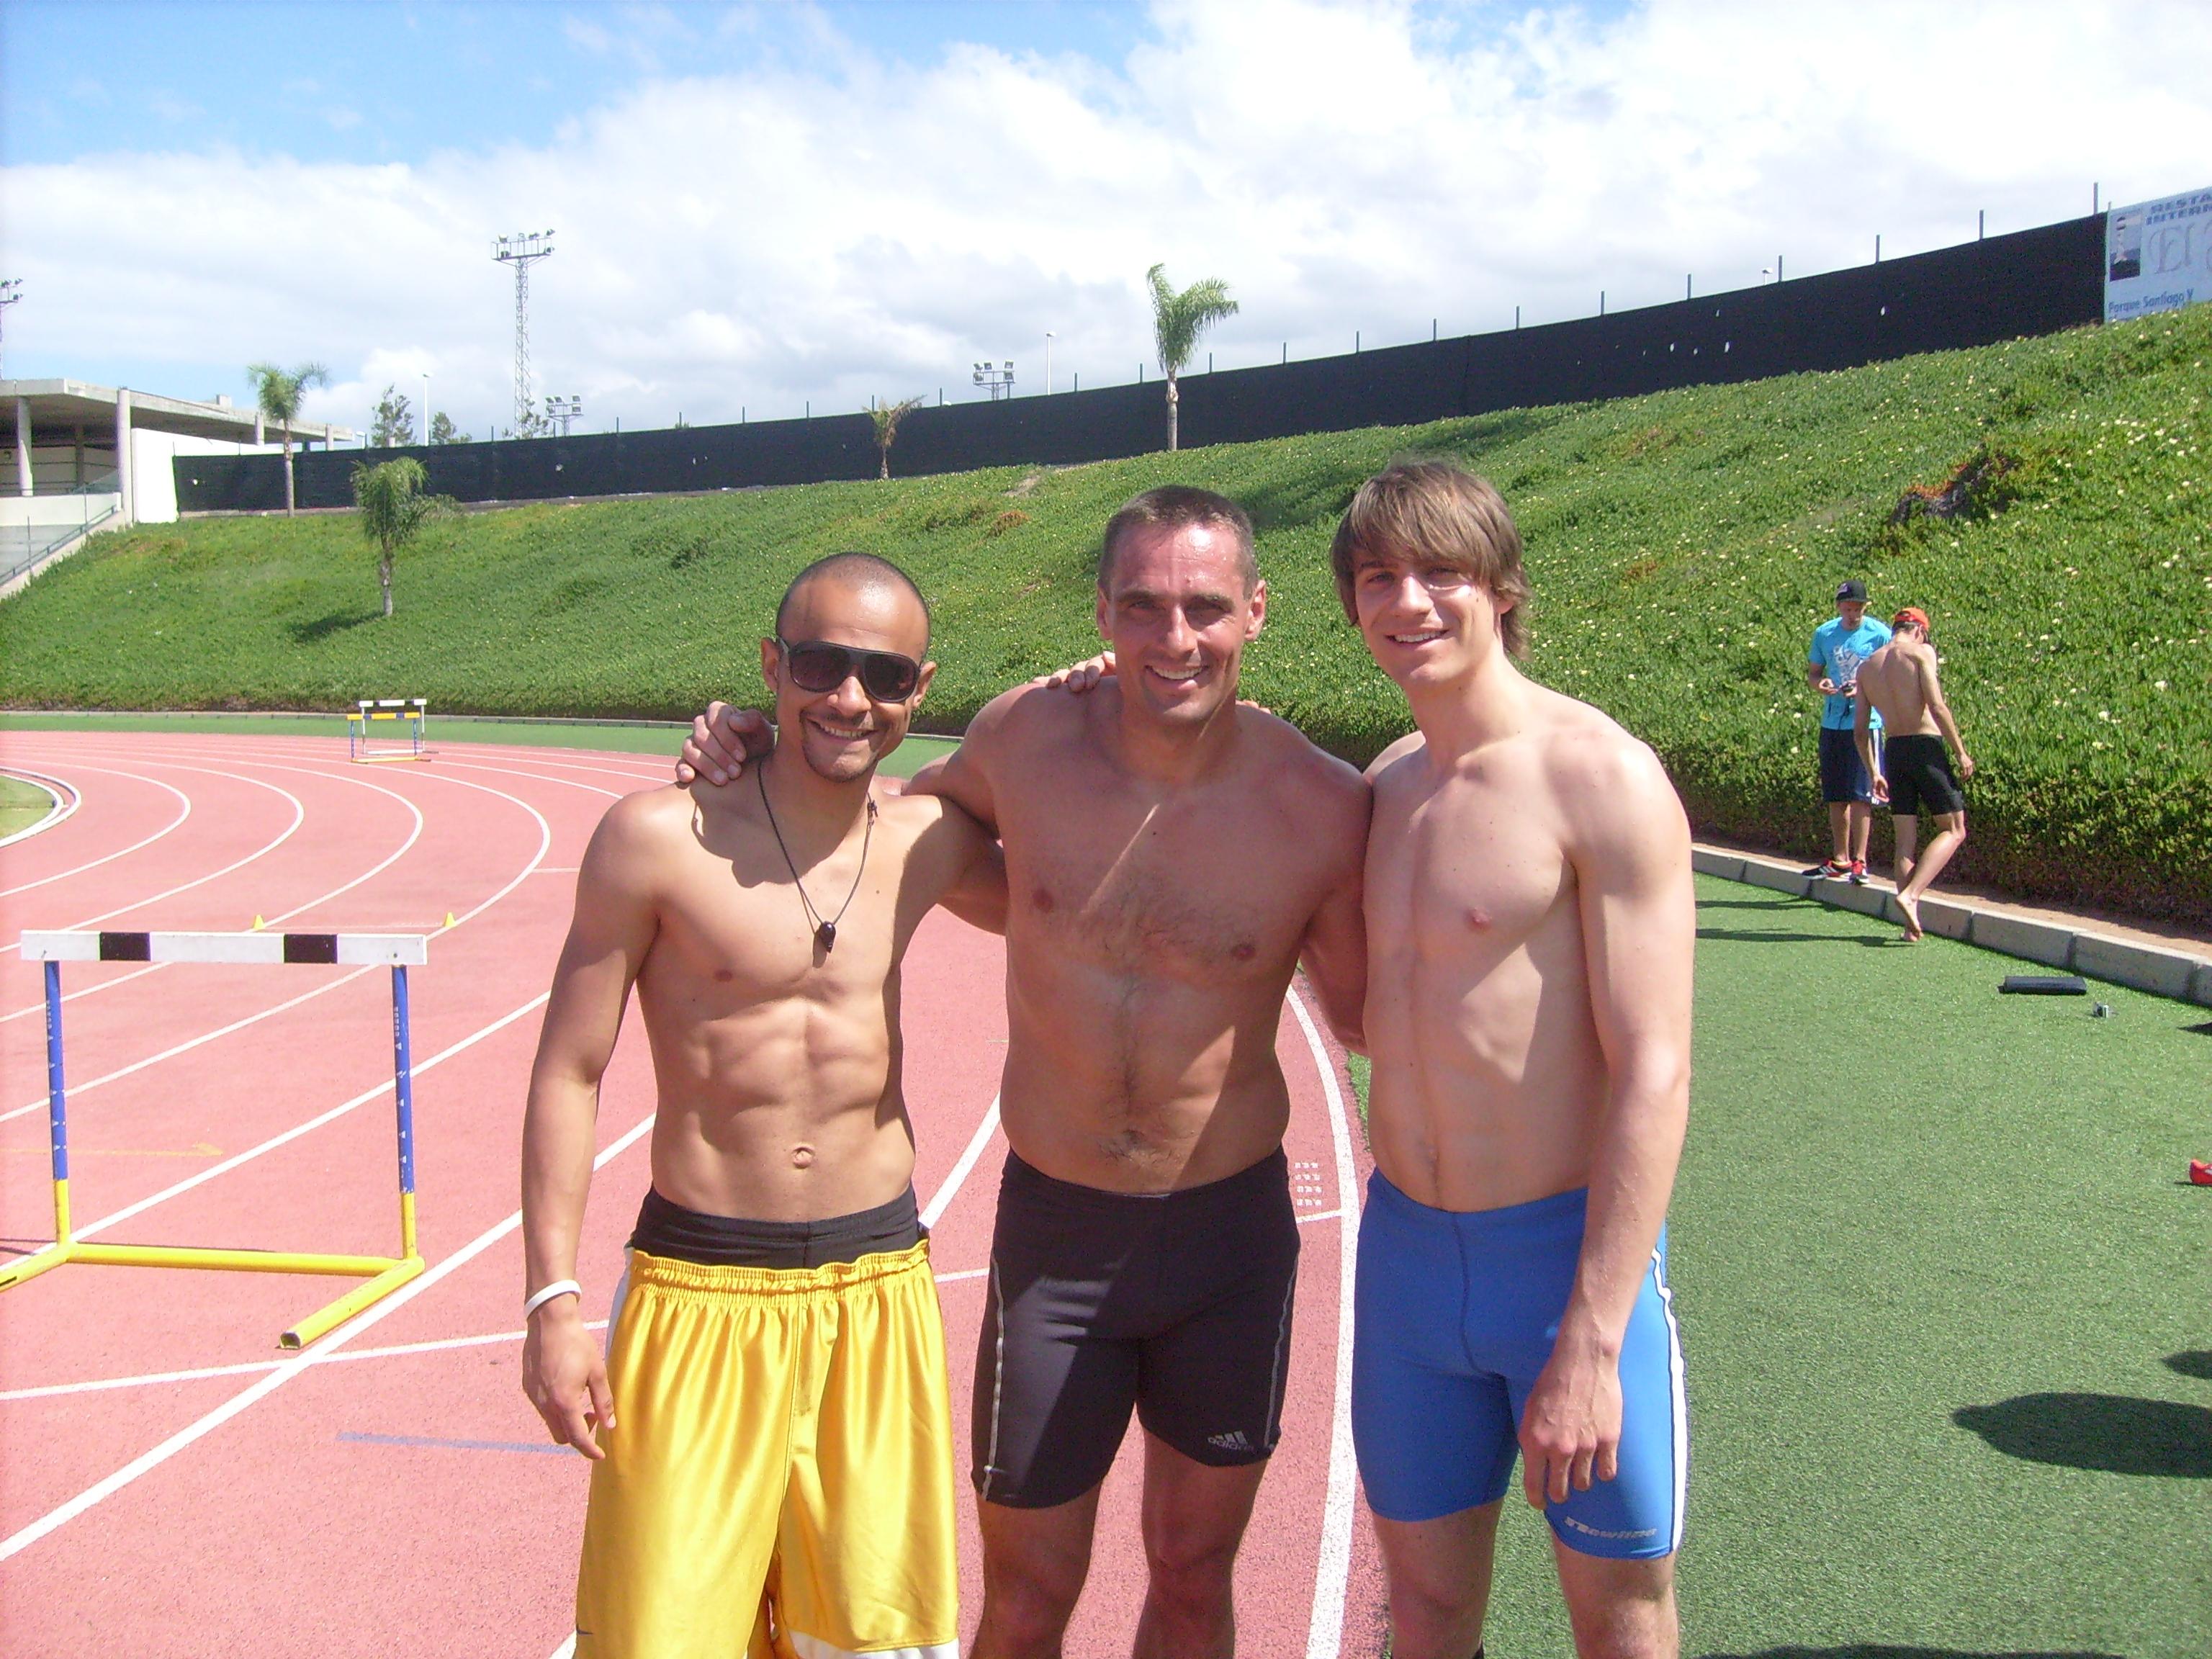 John Henry, Roman Sebrle, Fabian Sterzing